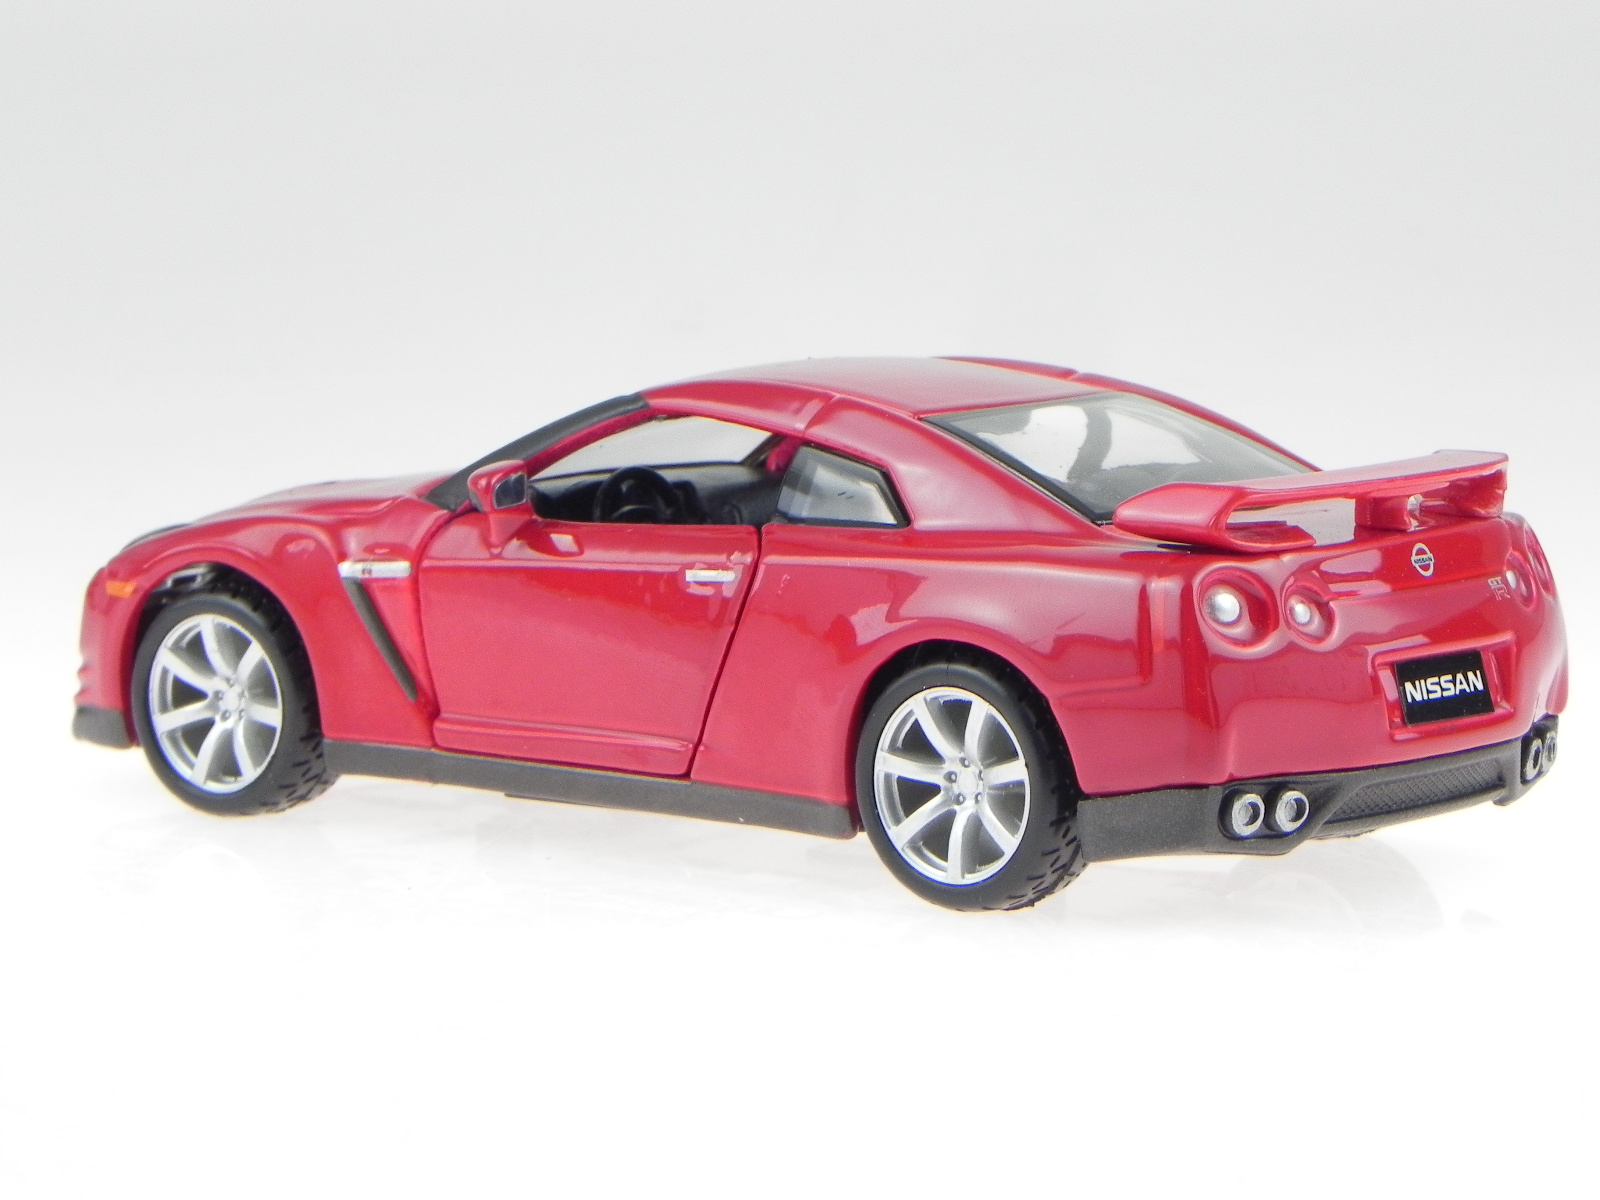 nissan gt r 2009 rot modellauto 42016 bburago 1 32 ebay. Black Bedroom Furniture Sets. Home Design Ideas